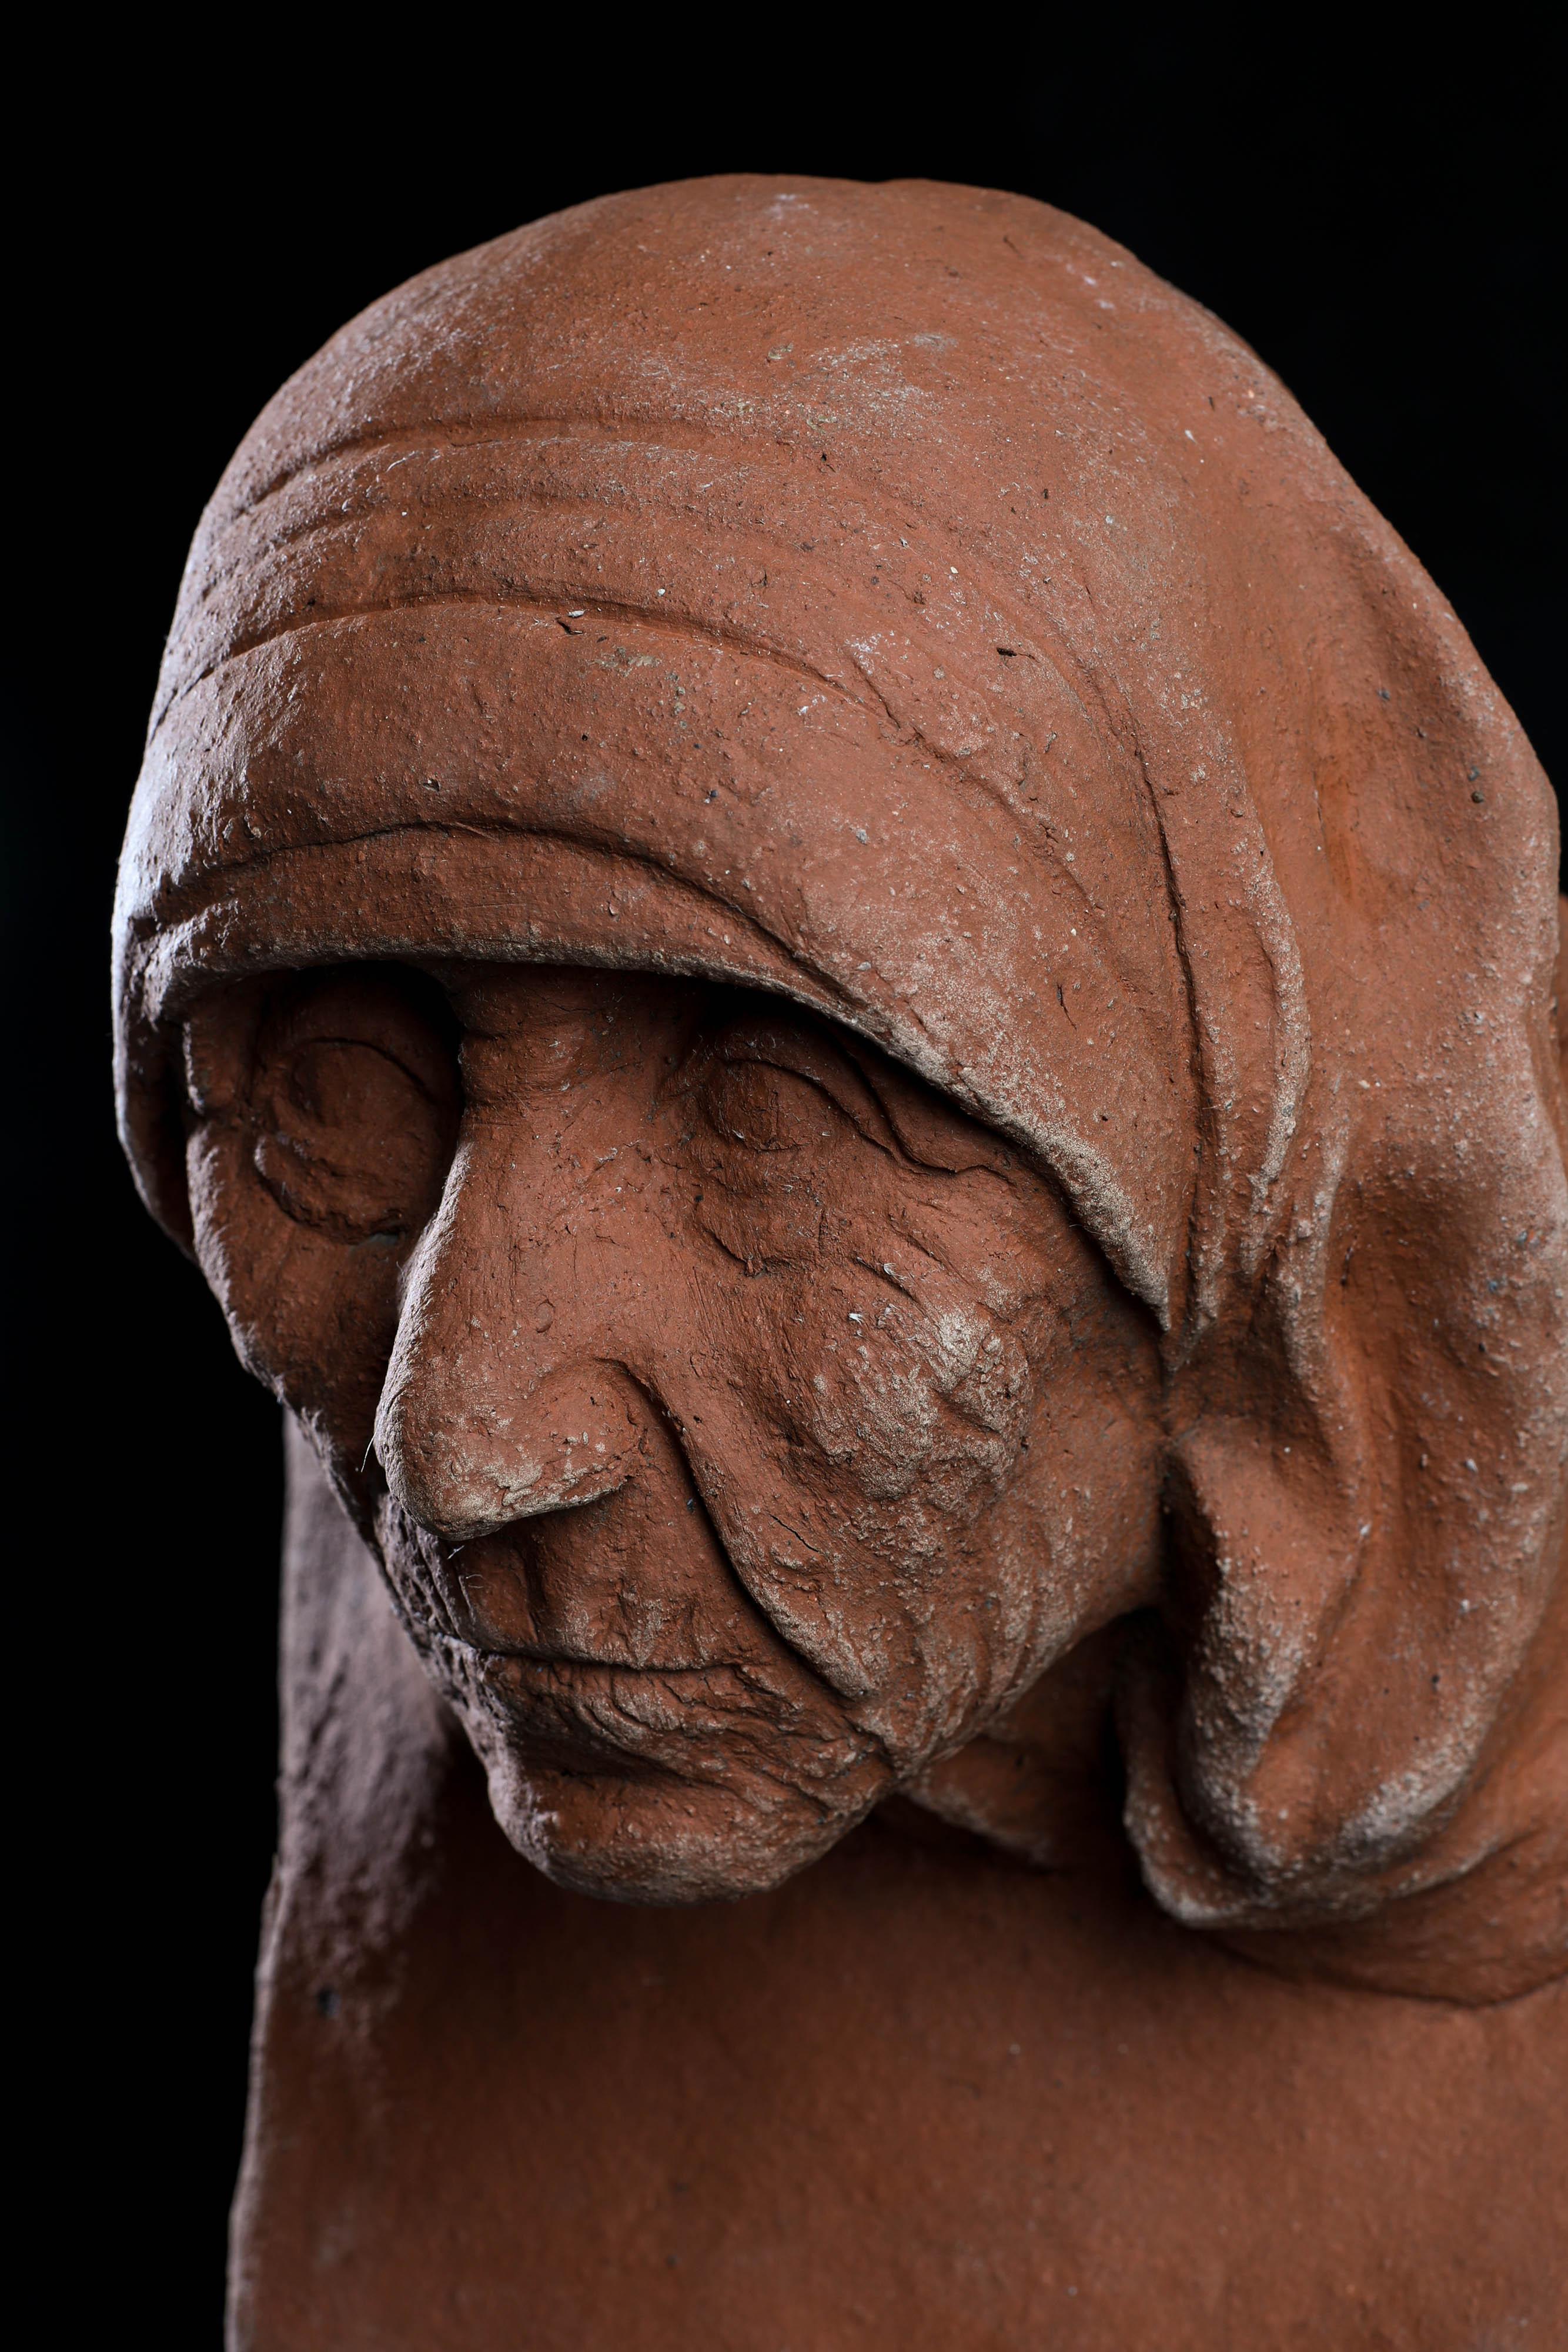 Głowa Matki Teresy, 1999 r.